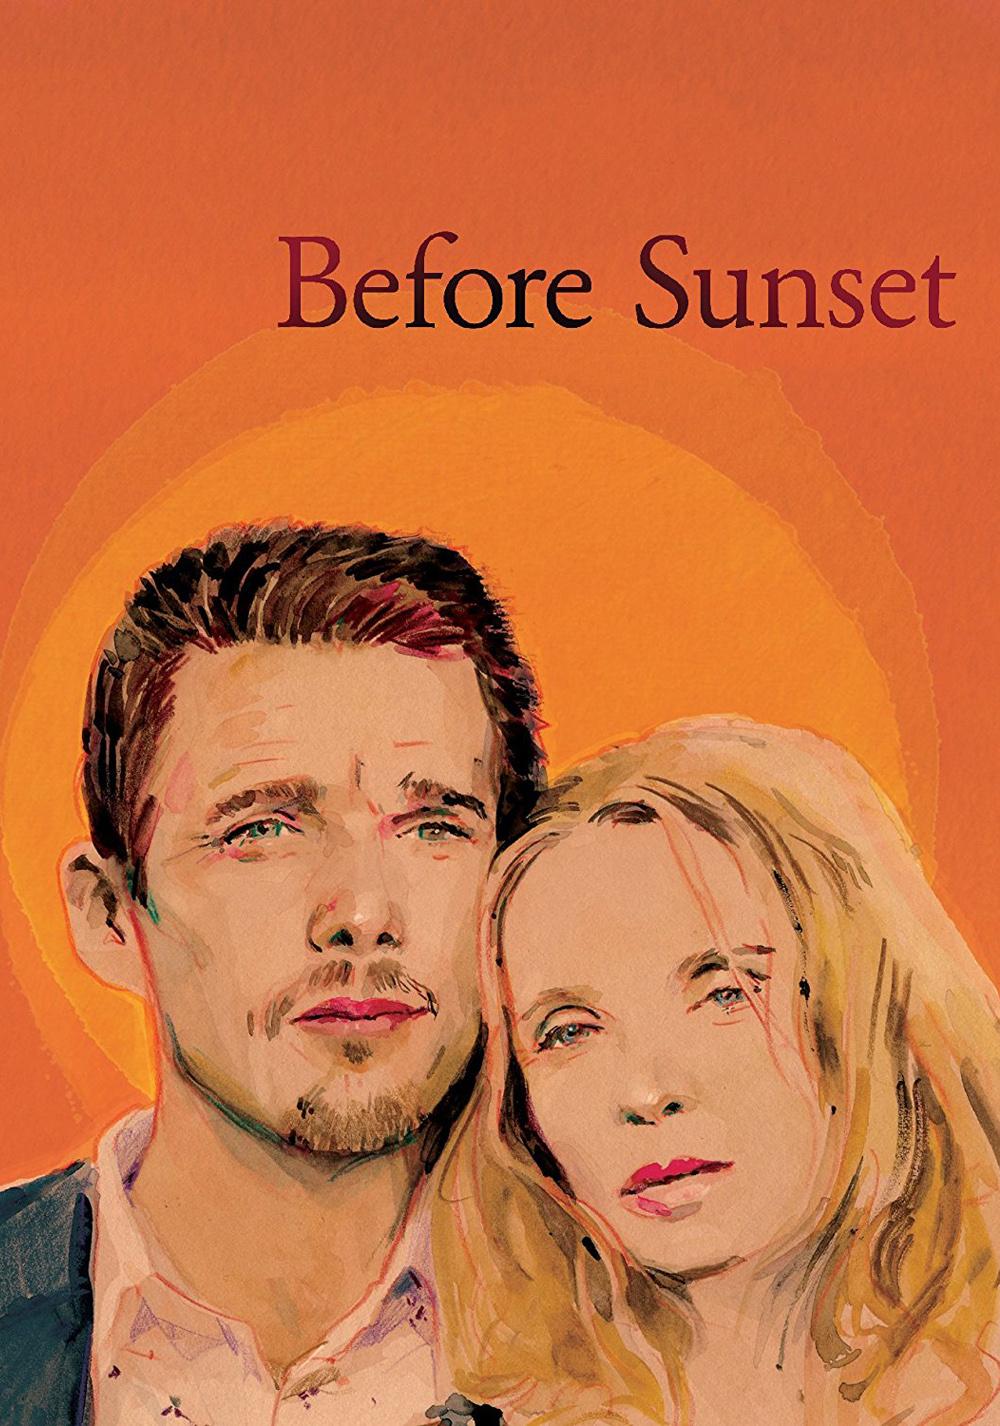 Before Sunset | Movie fanart | fanart.tv